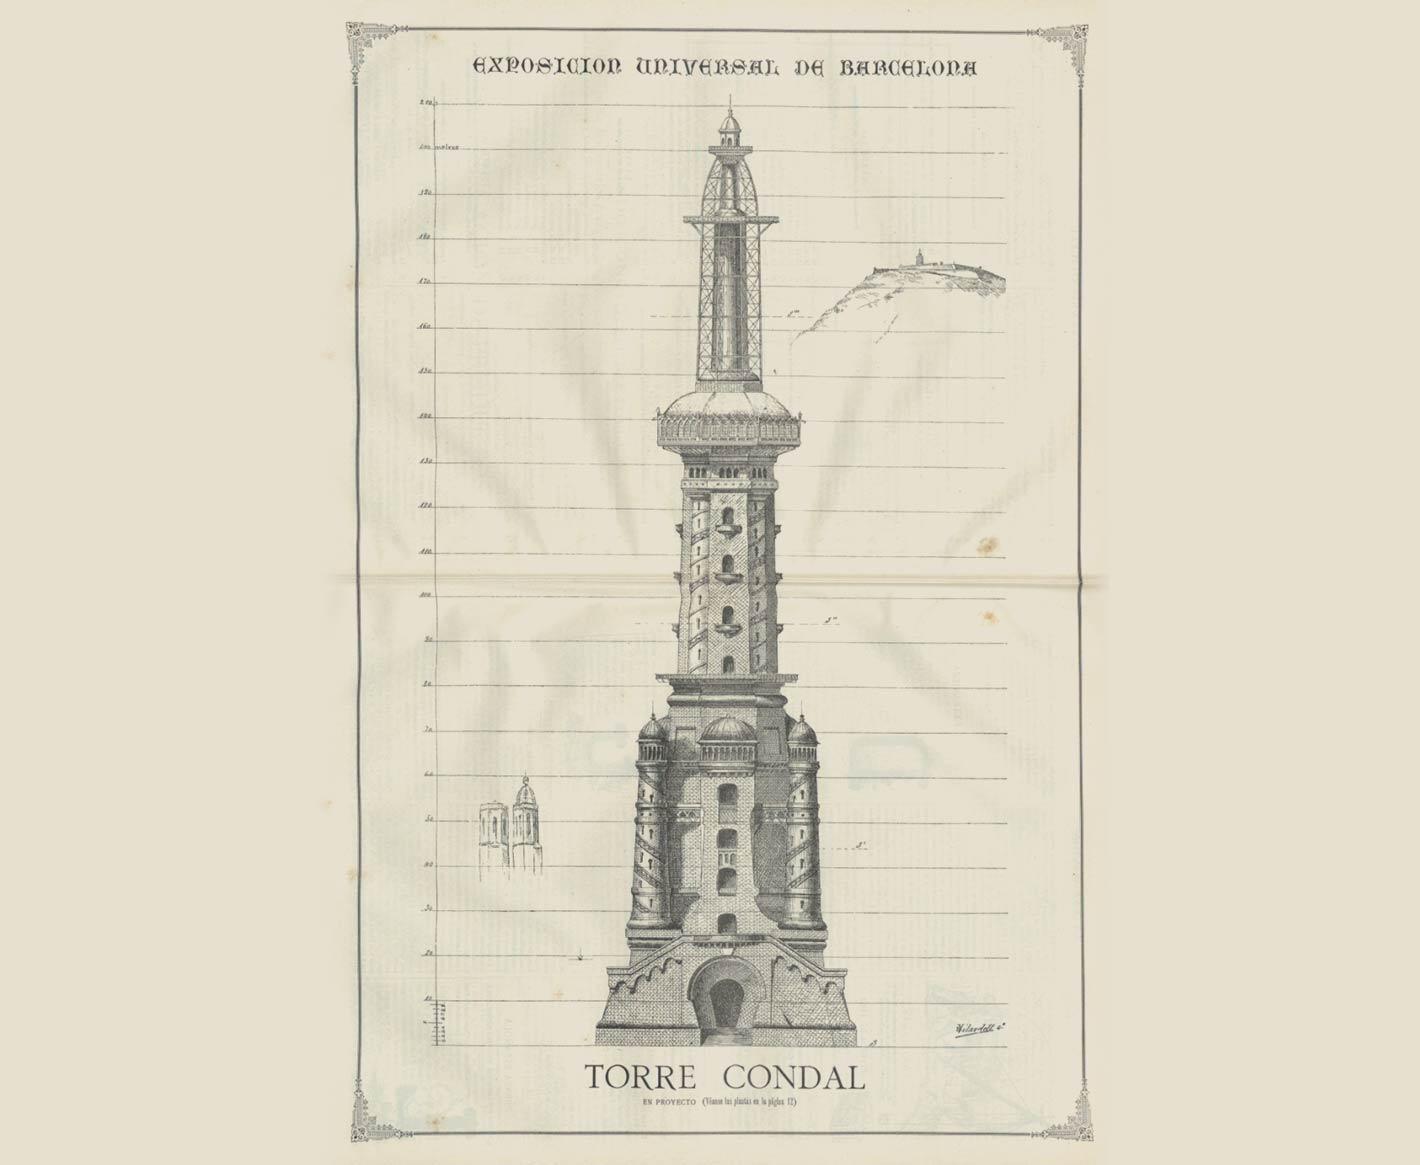 tour eiffel barcelona 1888